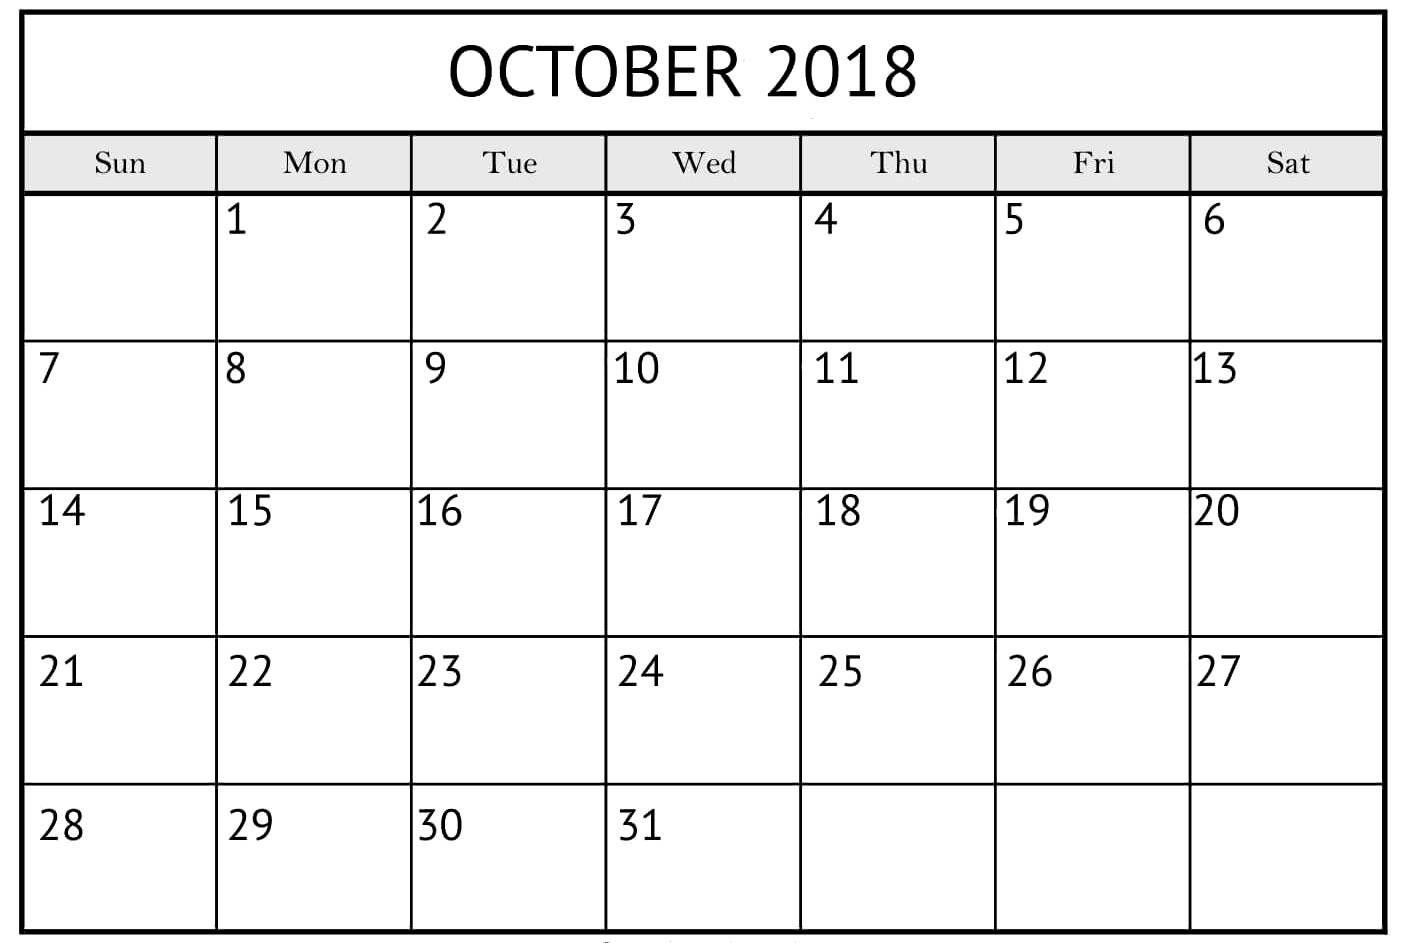 Blank October 2018 Pocket Calendar | October Calendar intended for Free Printable Pocket Calendar